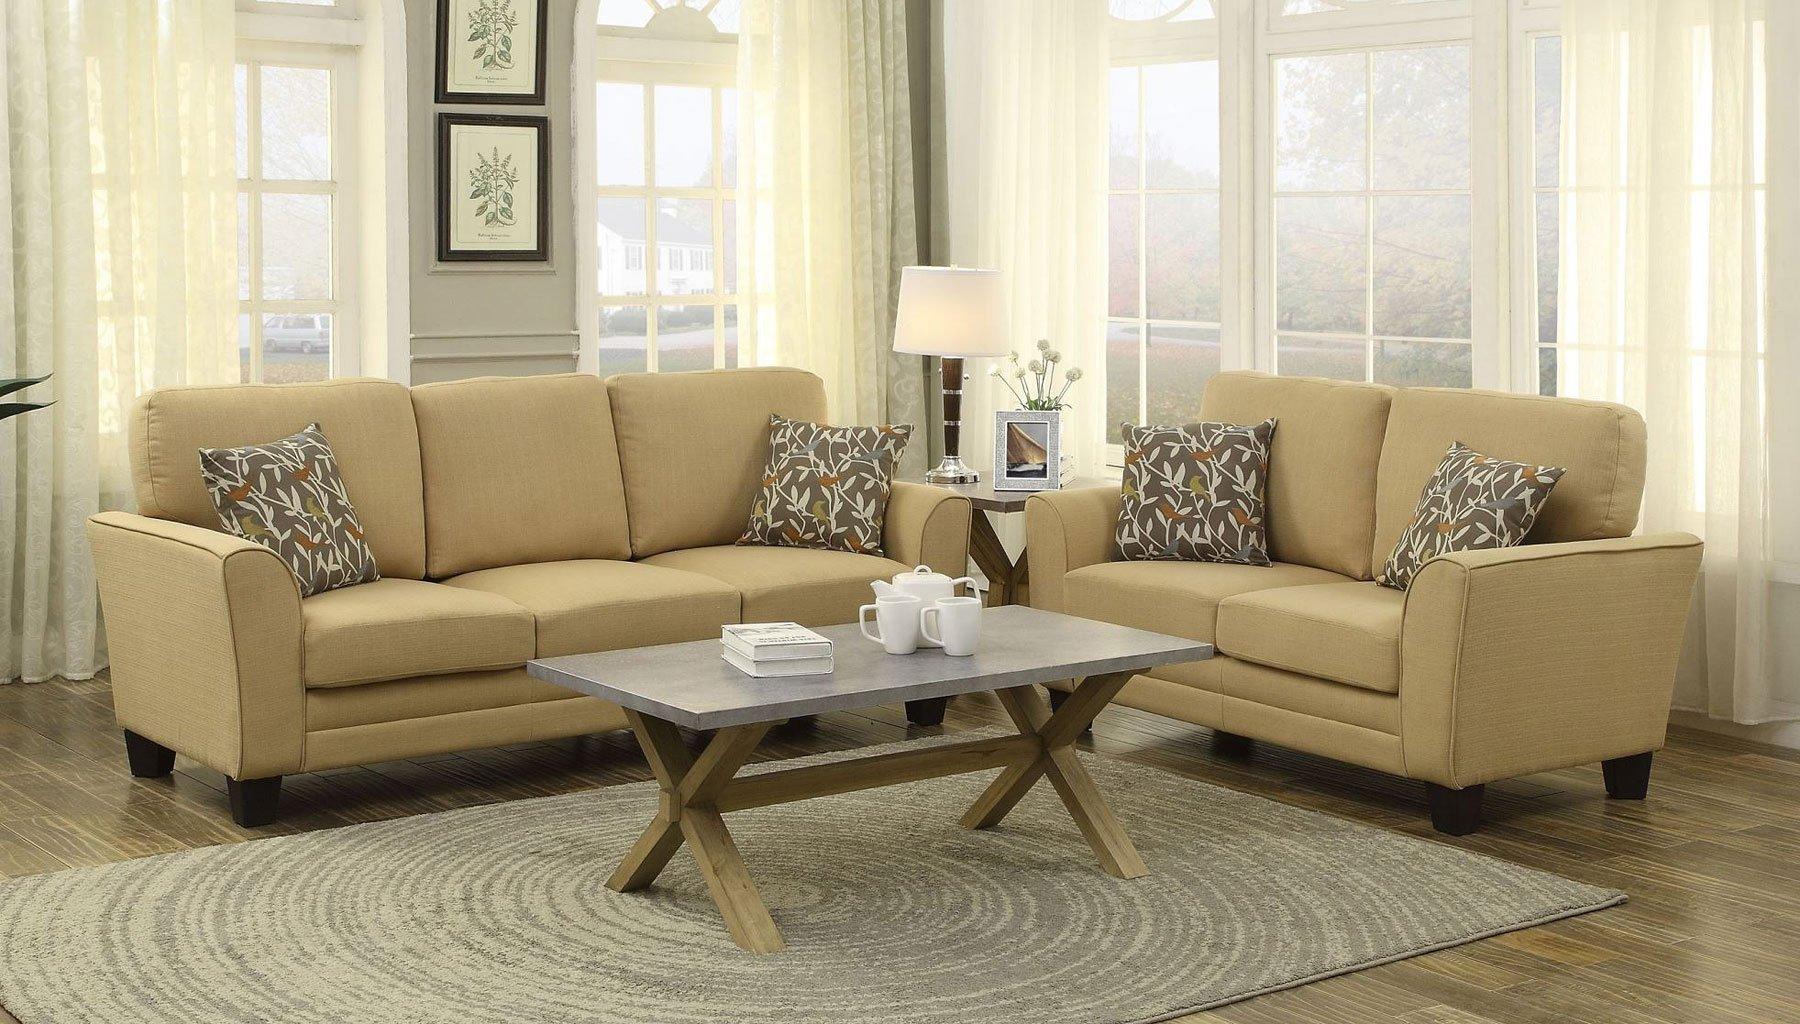 adair living room set yellow living room sets living room furniture living room. Black Bedroom Furniture Sets. Home Design Ideas